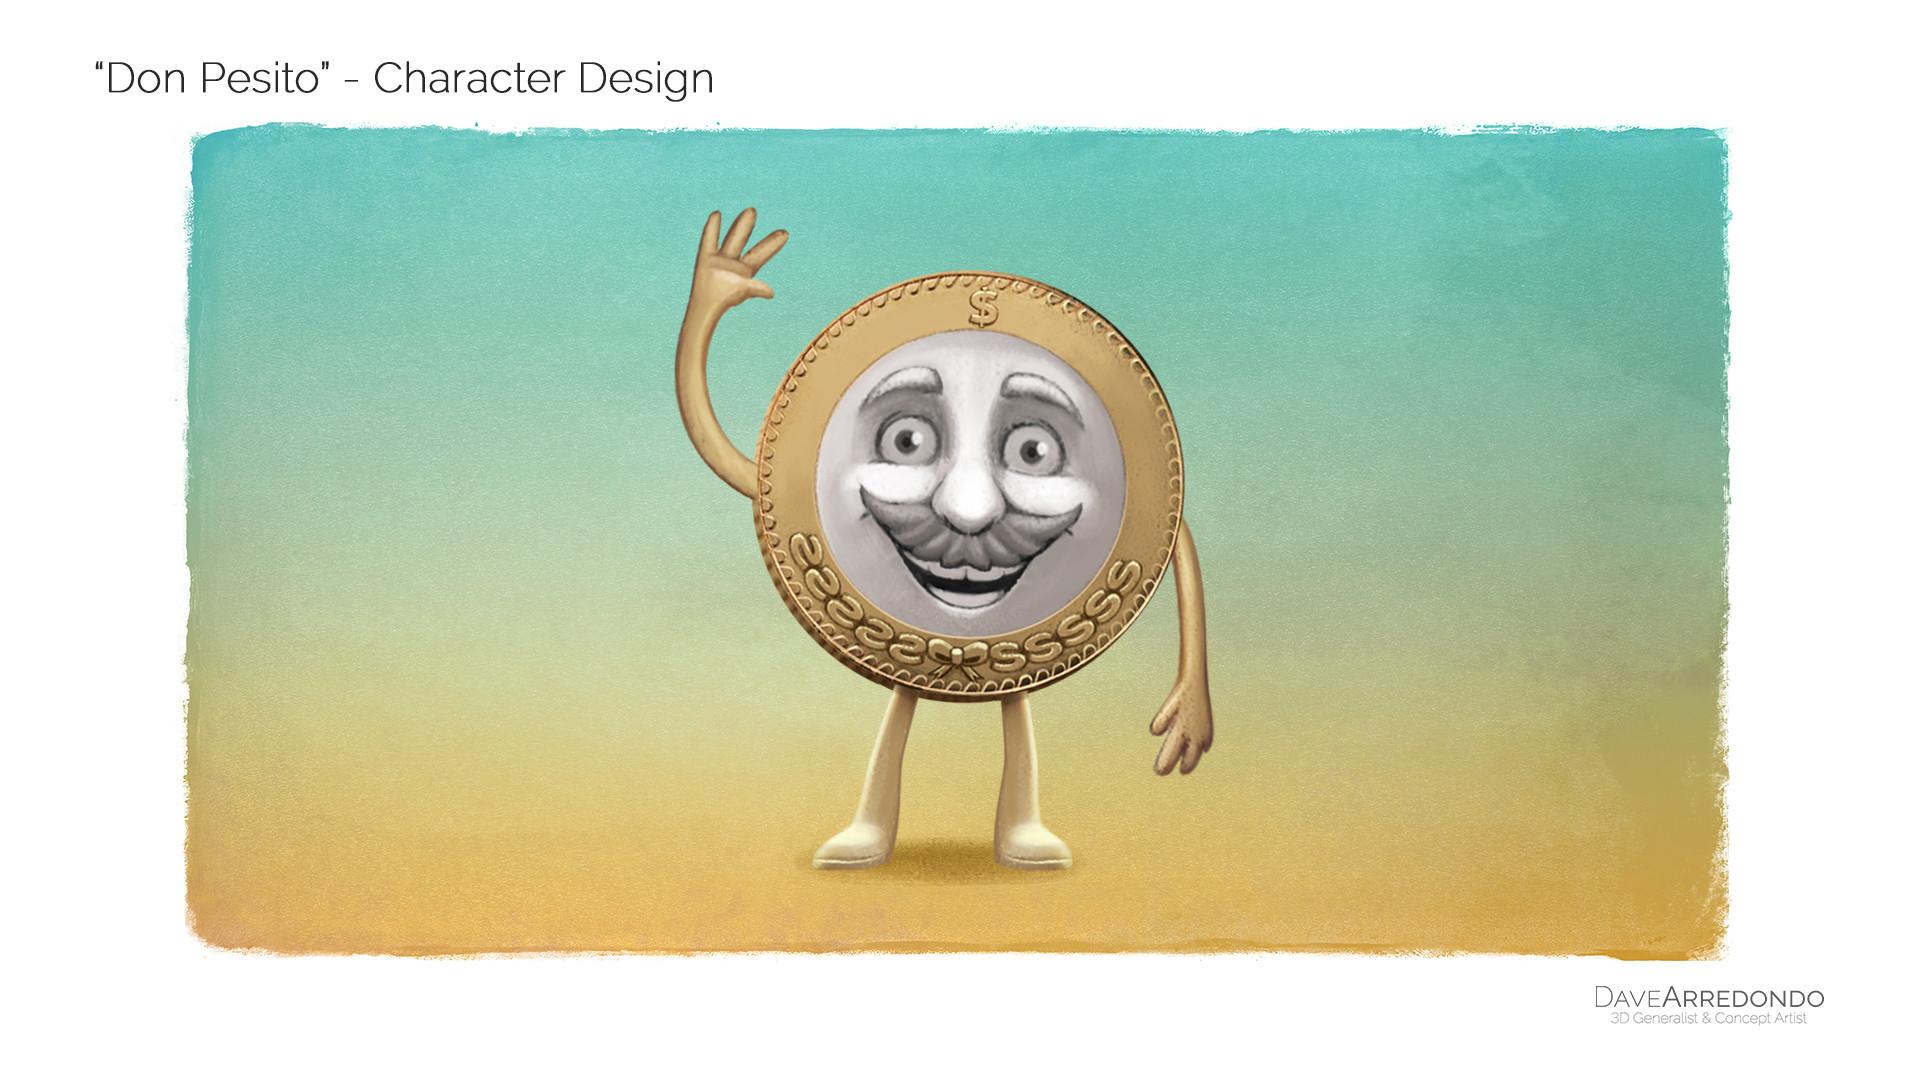 Dave arredondo donpesito characterdesign 002